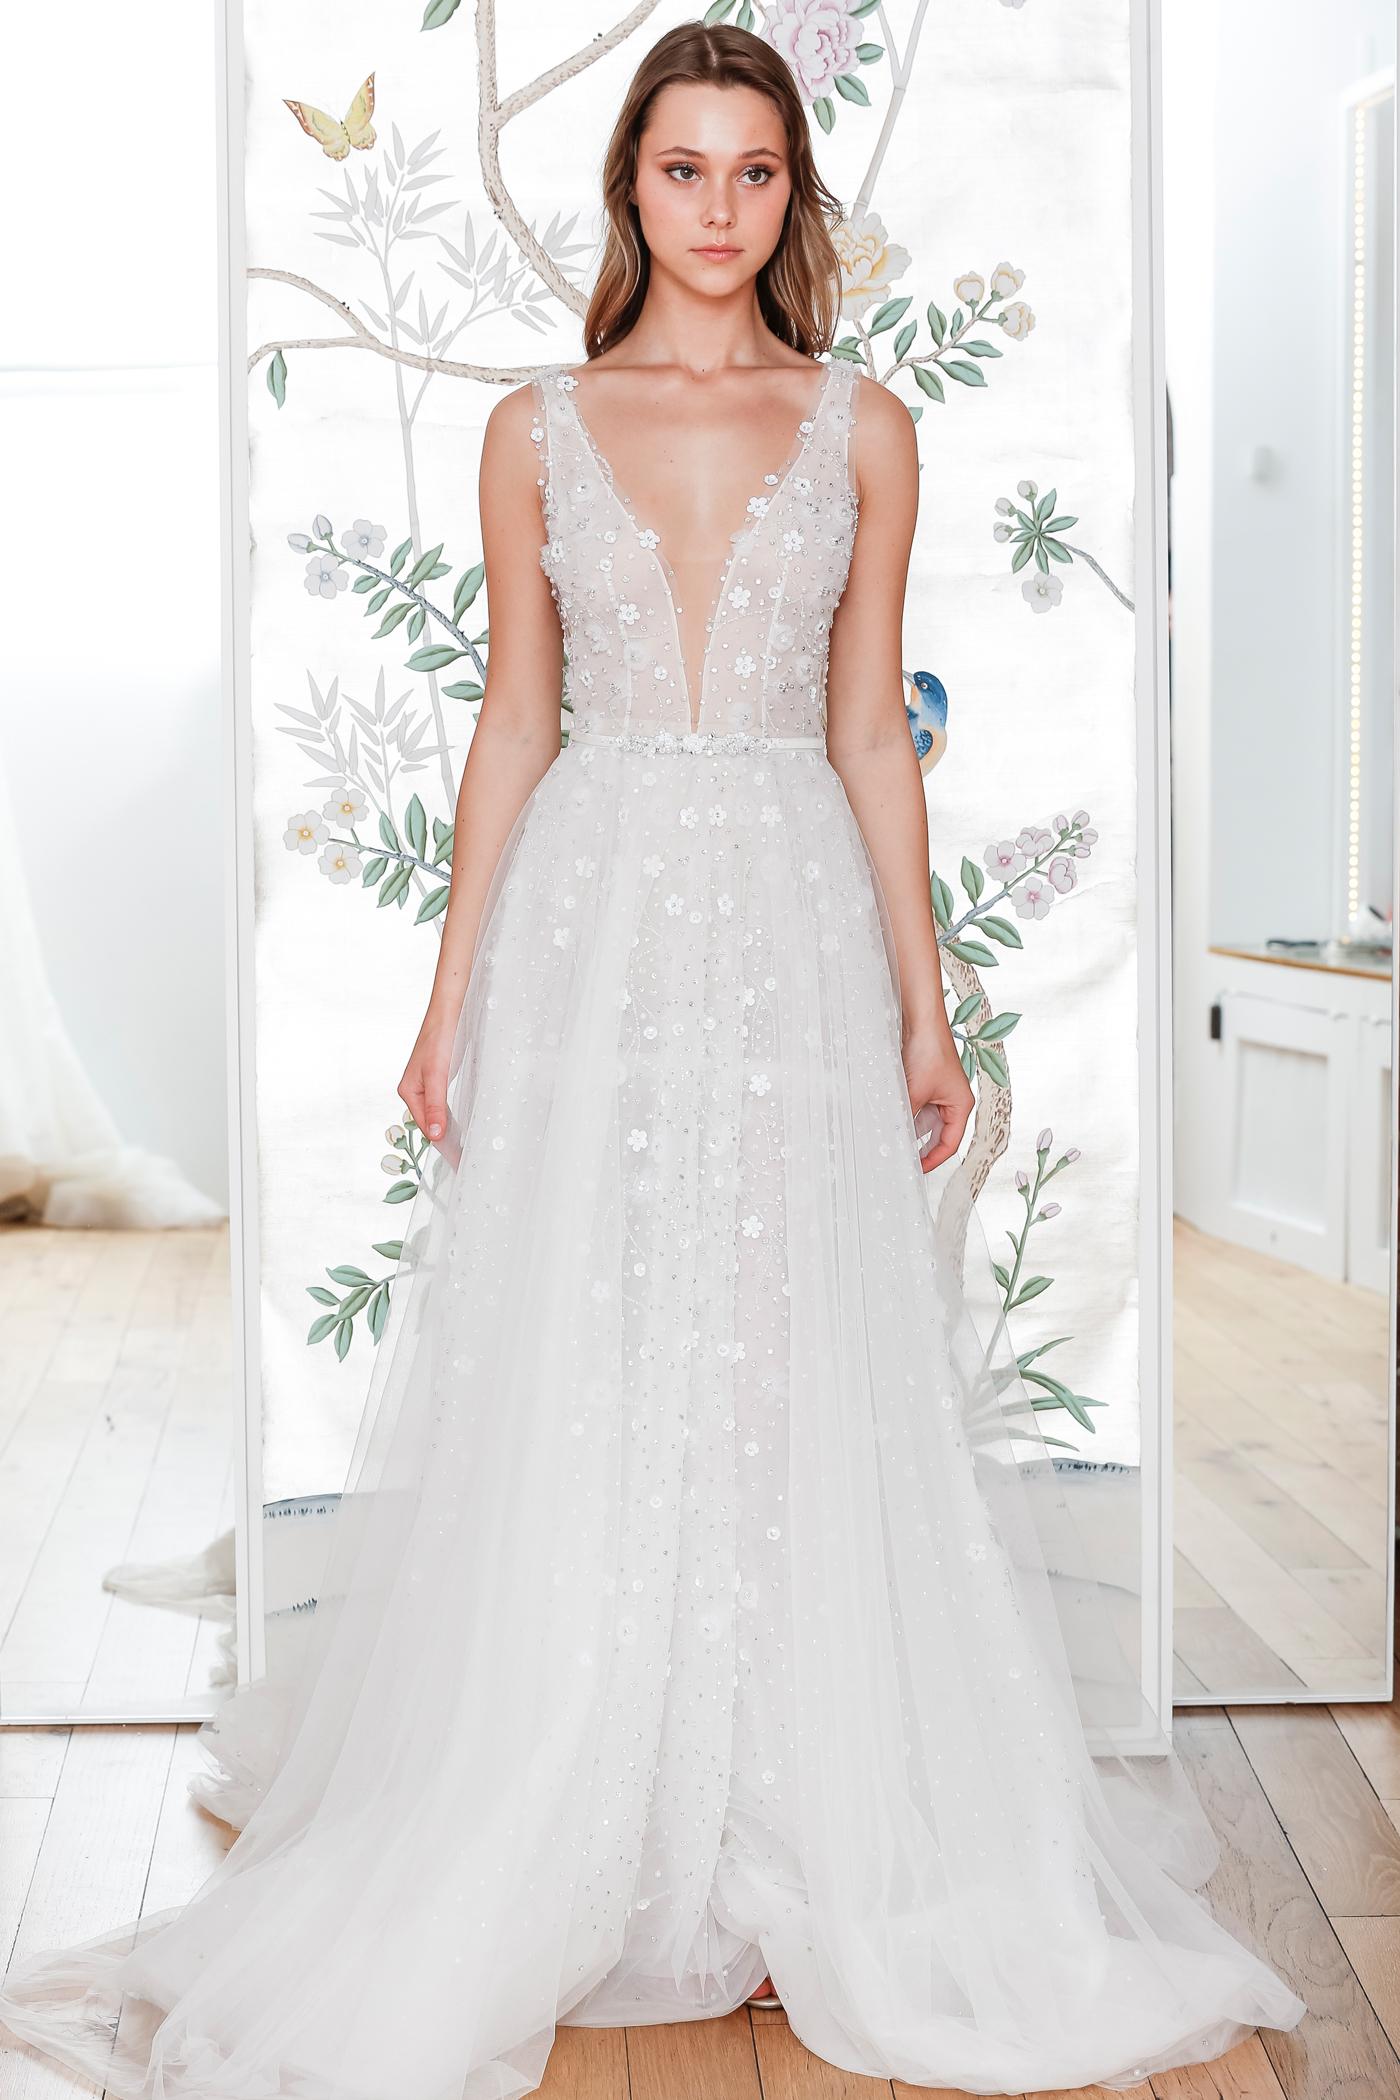 lee petra grebenau belted sleeveless plunging neckline wedding dress with overskirt spring 2020